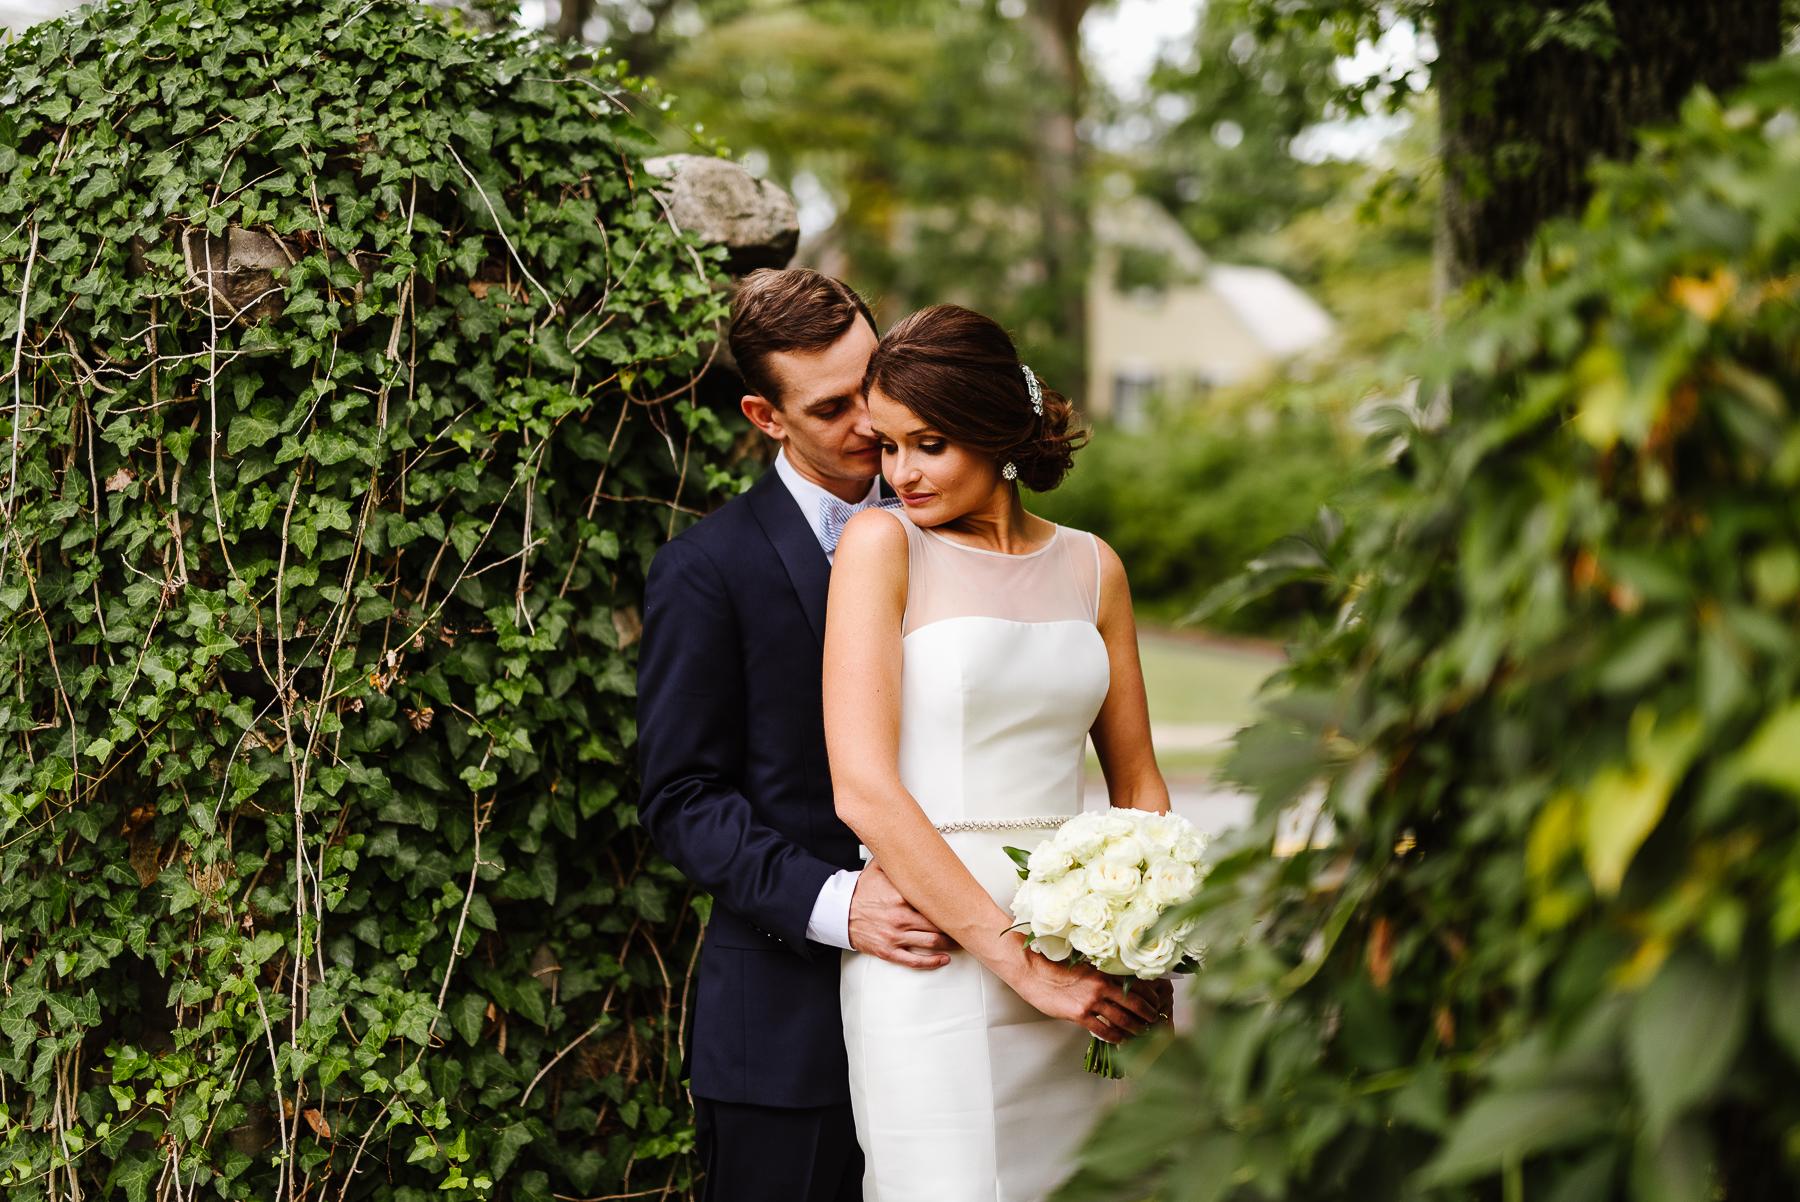 82-J Crew Wedding New Jersey Wedding Photographer J Crew Weddings.jpg